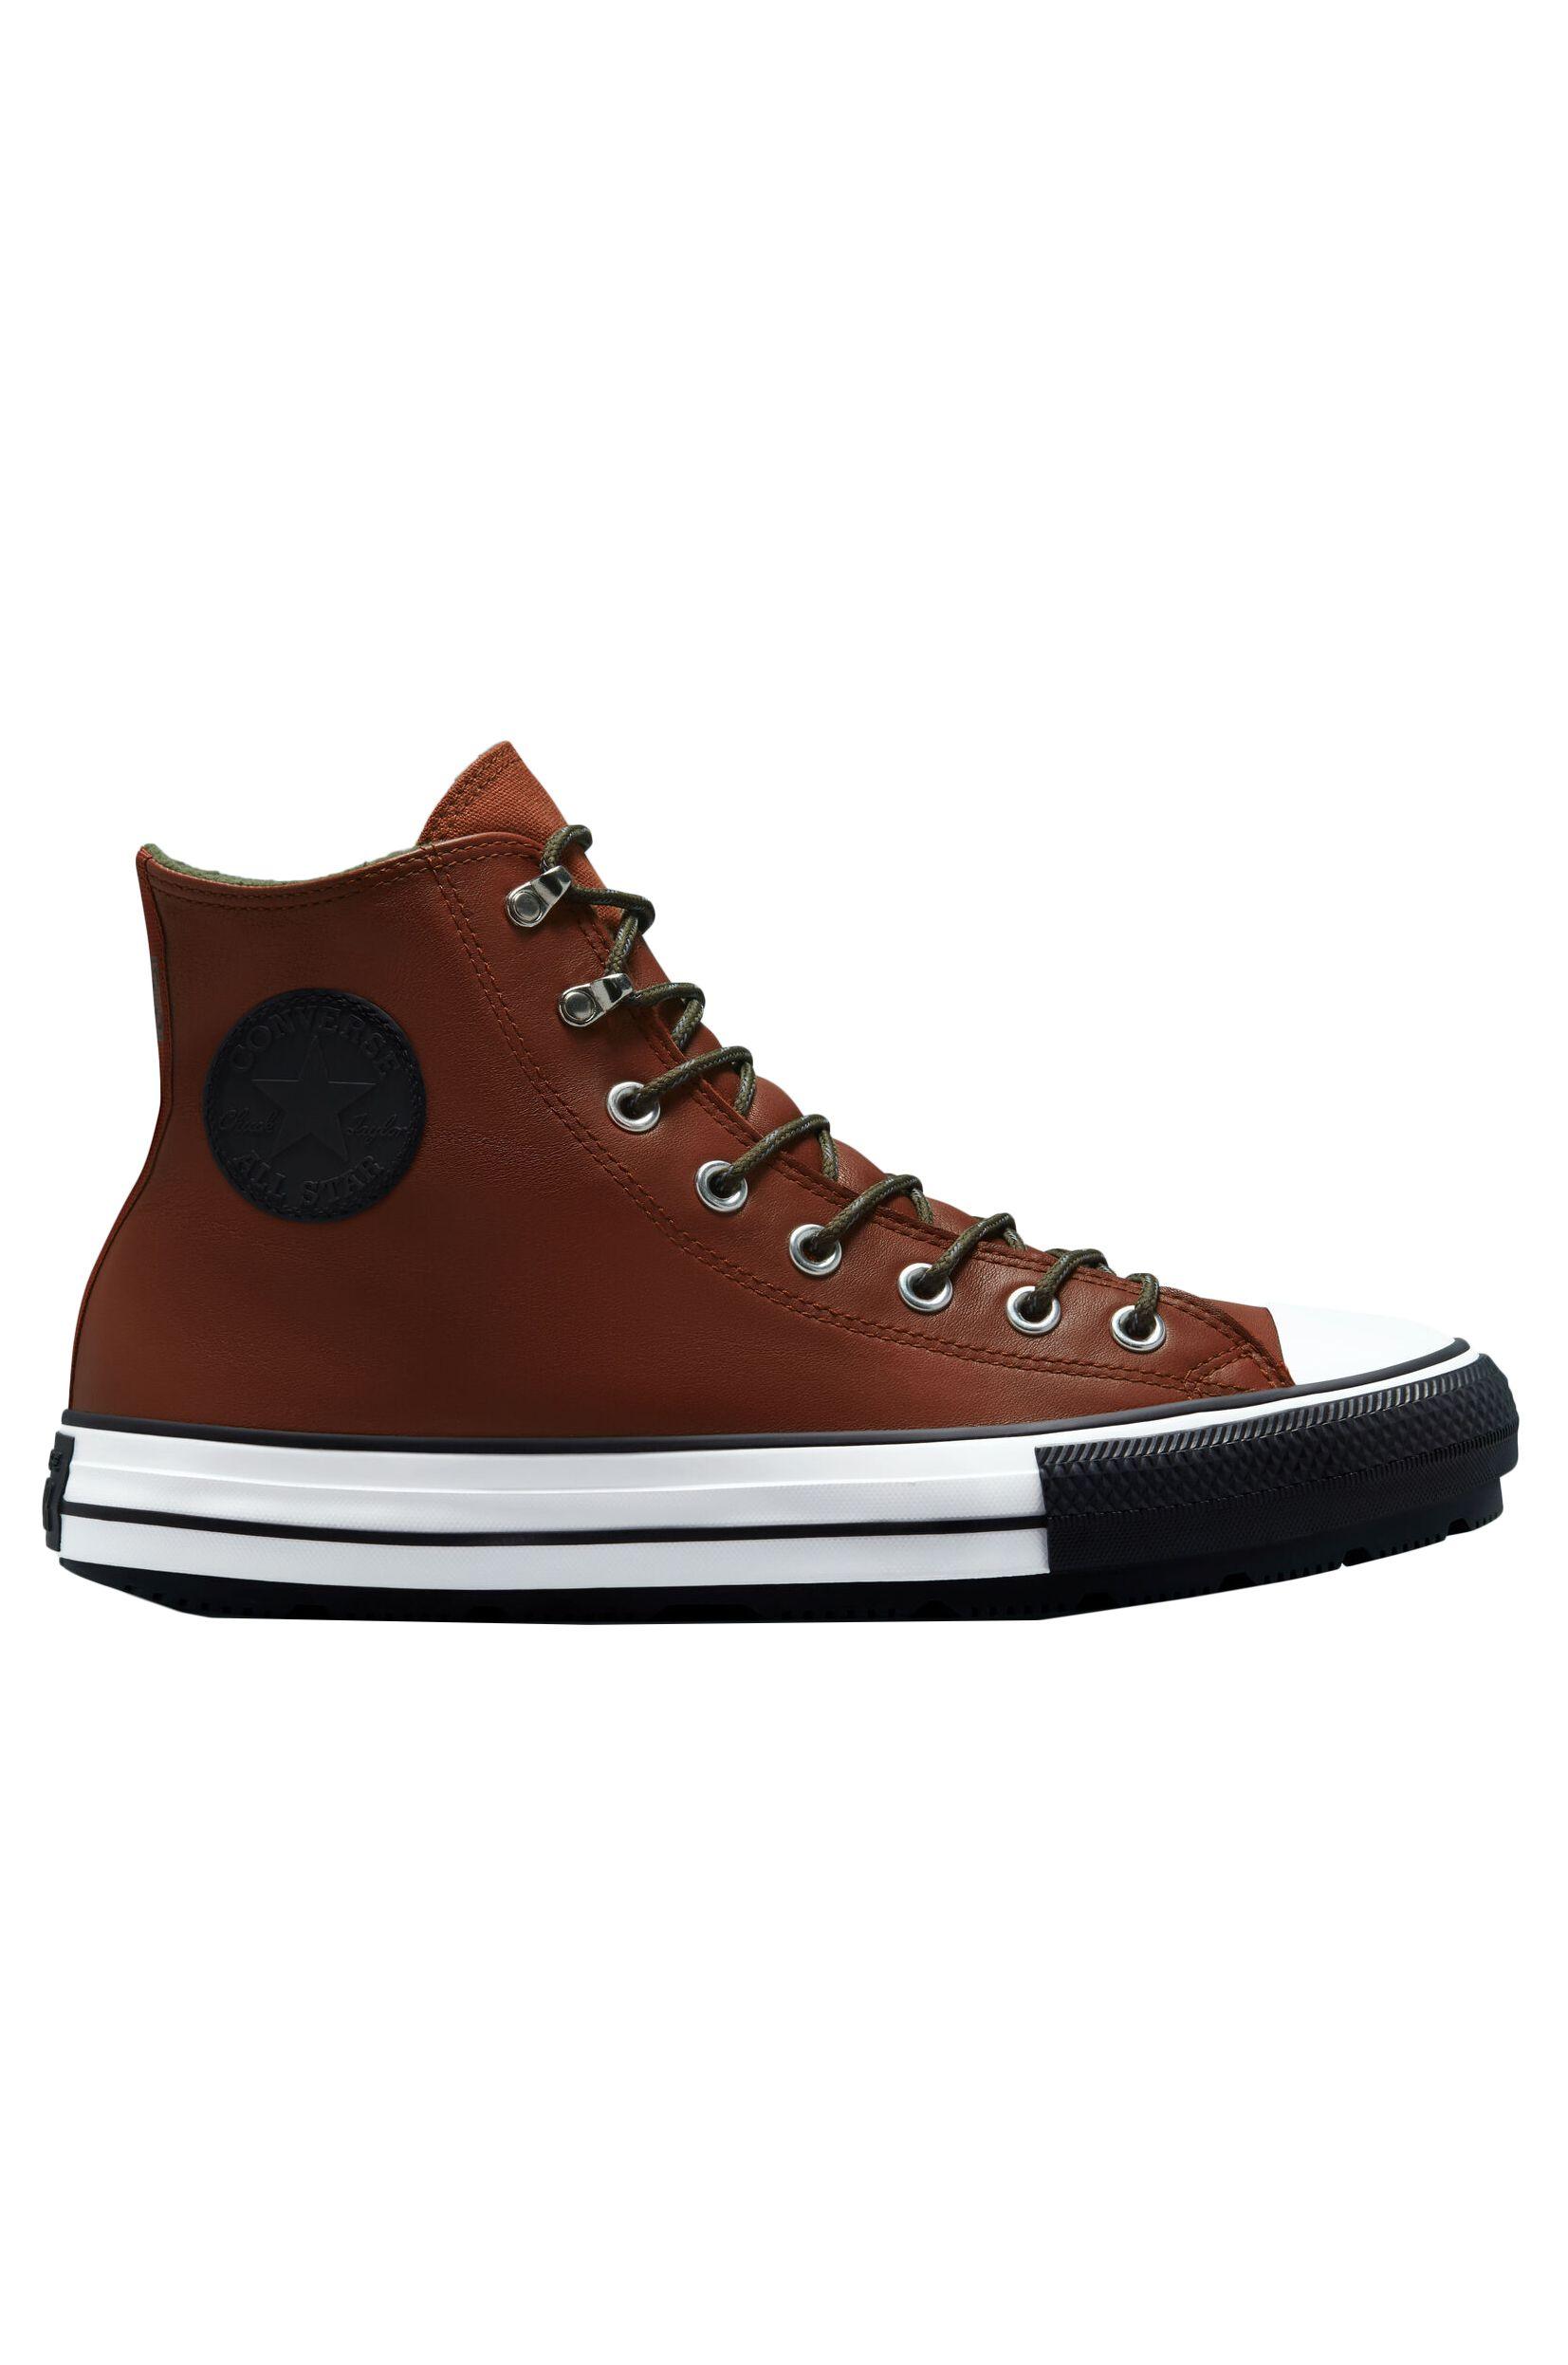 Converse Shoes CHUCK TAYLOR ALL STAR WINTER HI Cedar Bark/White/Black